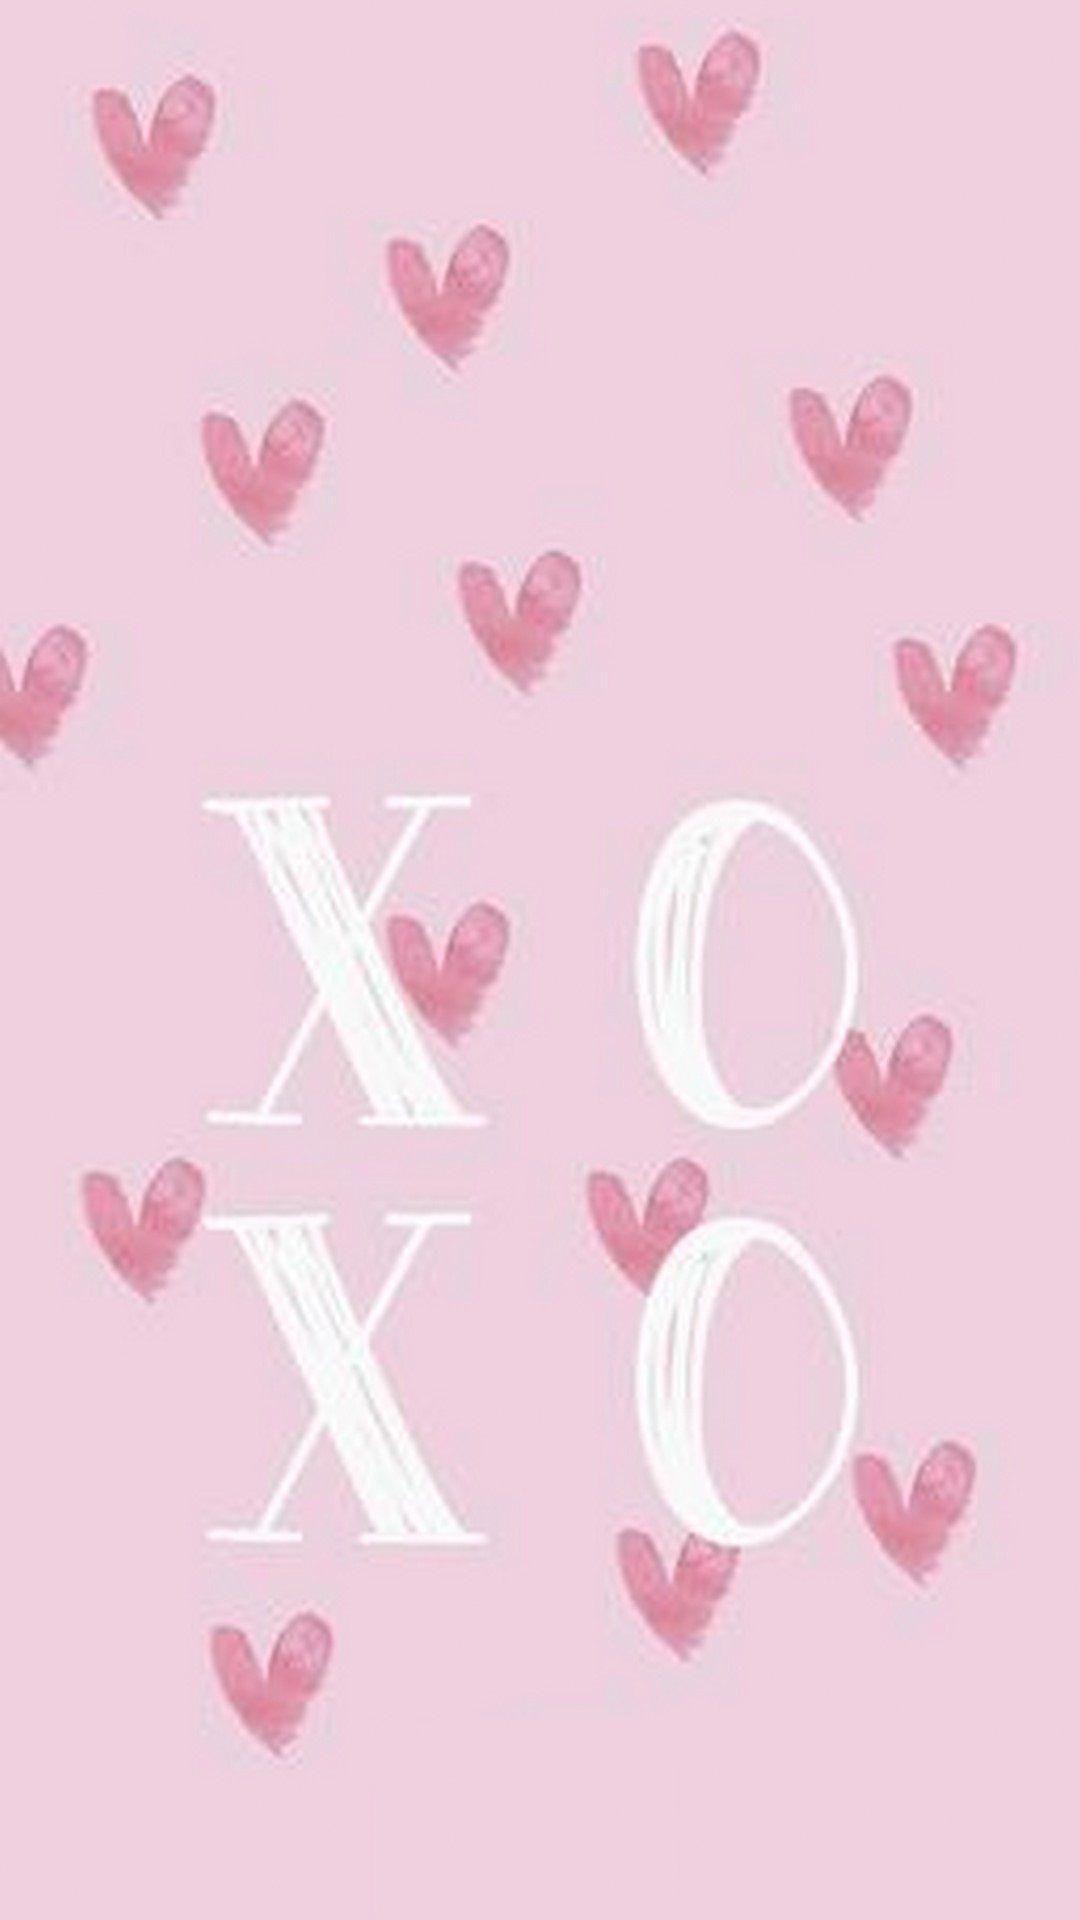 Heart Valentine Iphone Wallpaper Best Hd Wallpapers Iphonewallpaperquotes Valentines Wallpaper Iphone Valentines Wallpaper Pink Wallpaper Iphone